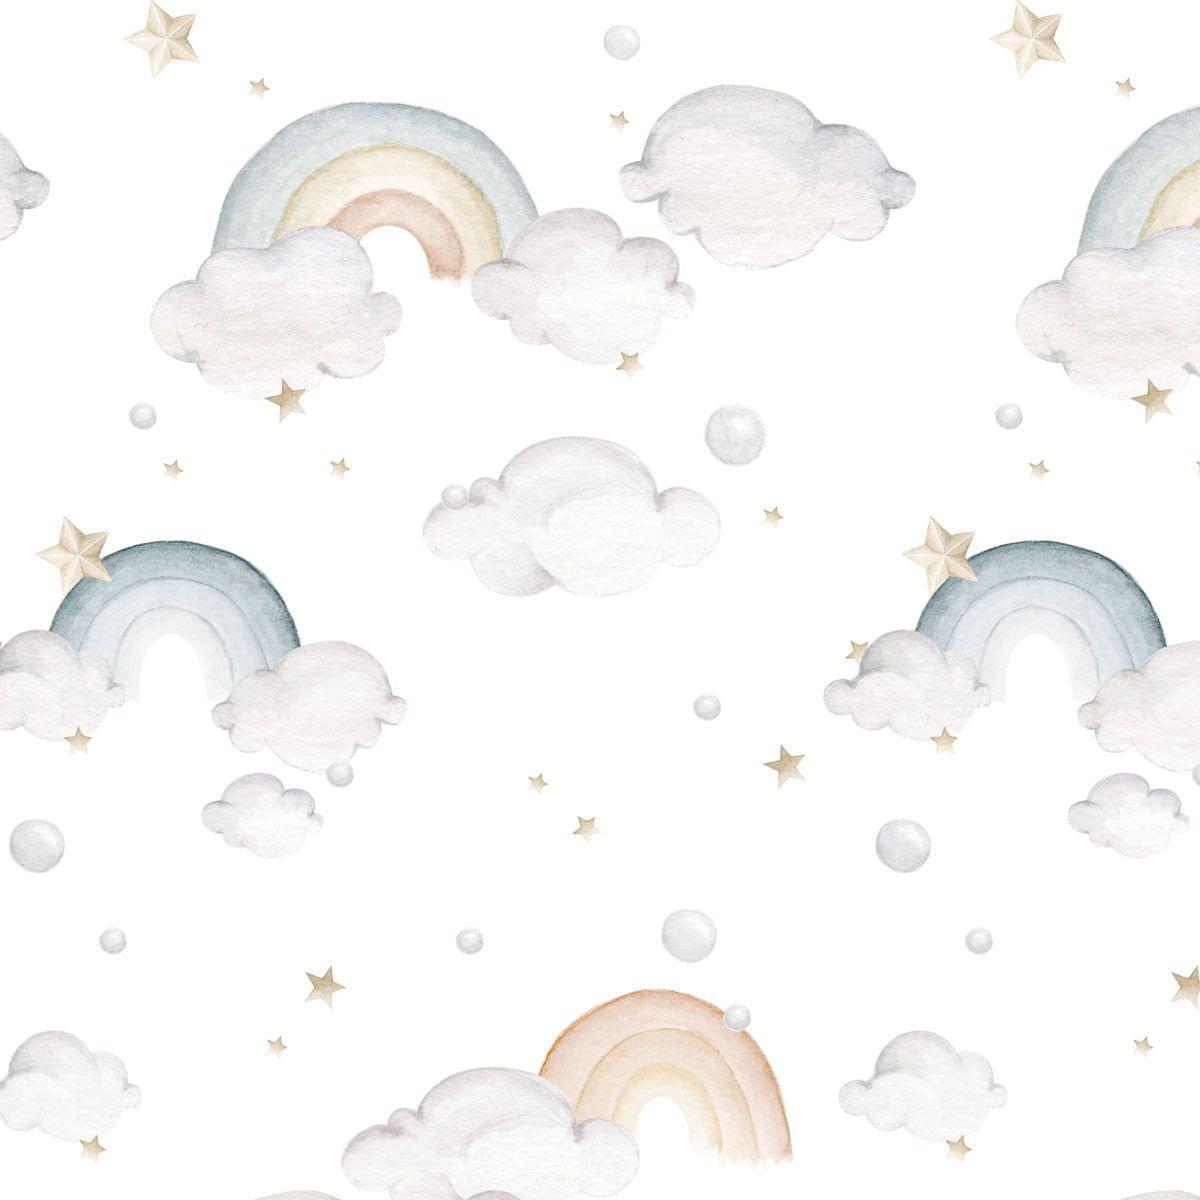 Rainbows Wallpaper Dekornik Com Wallstickers And Wallpapers Store